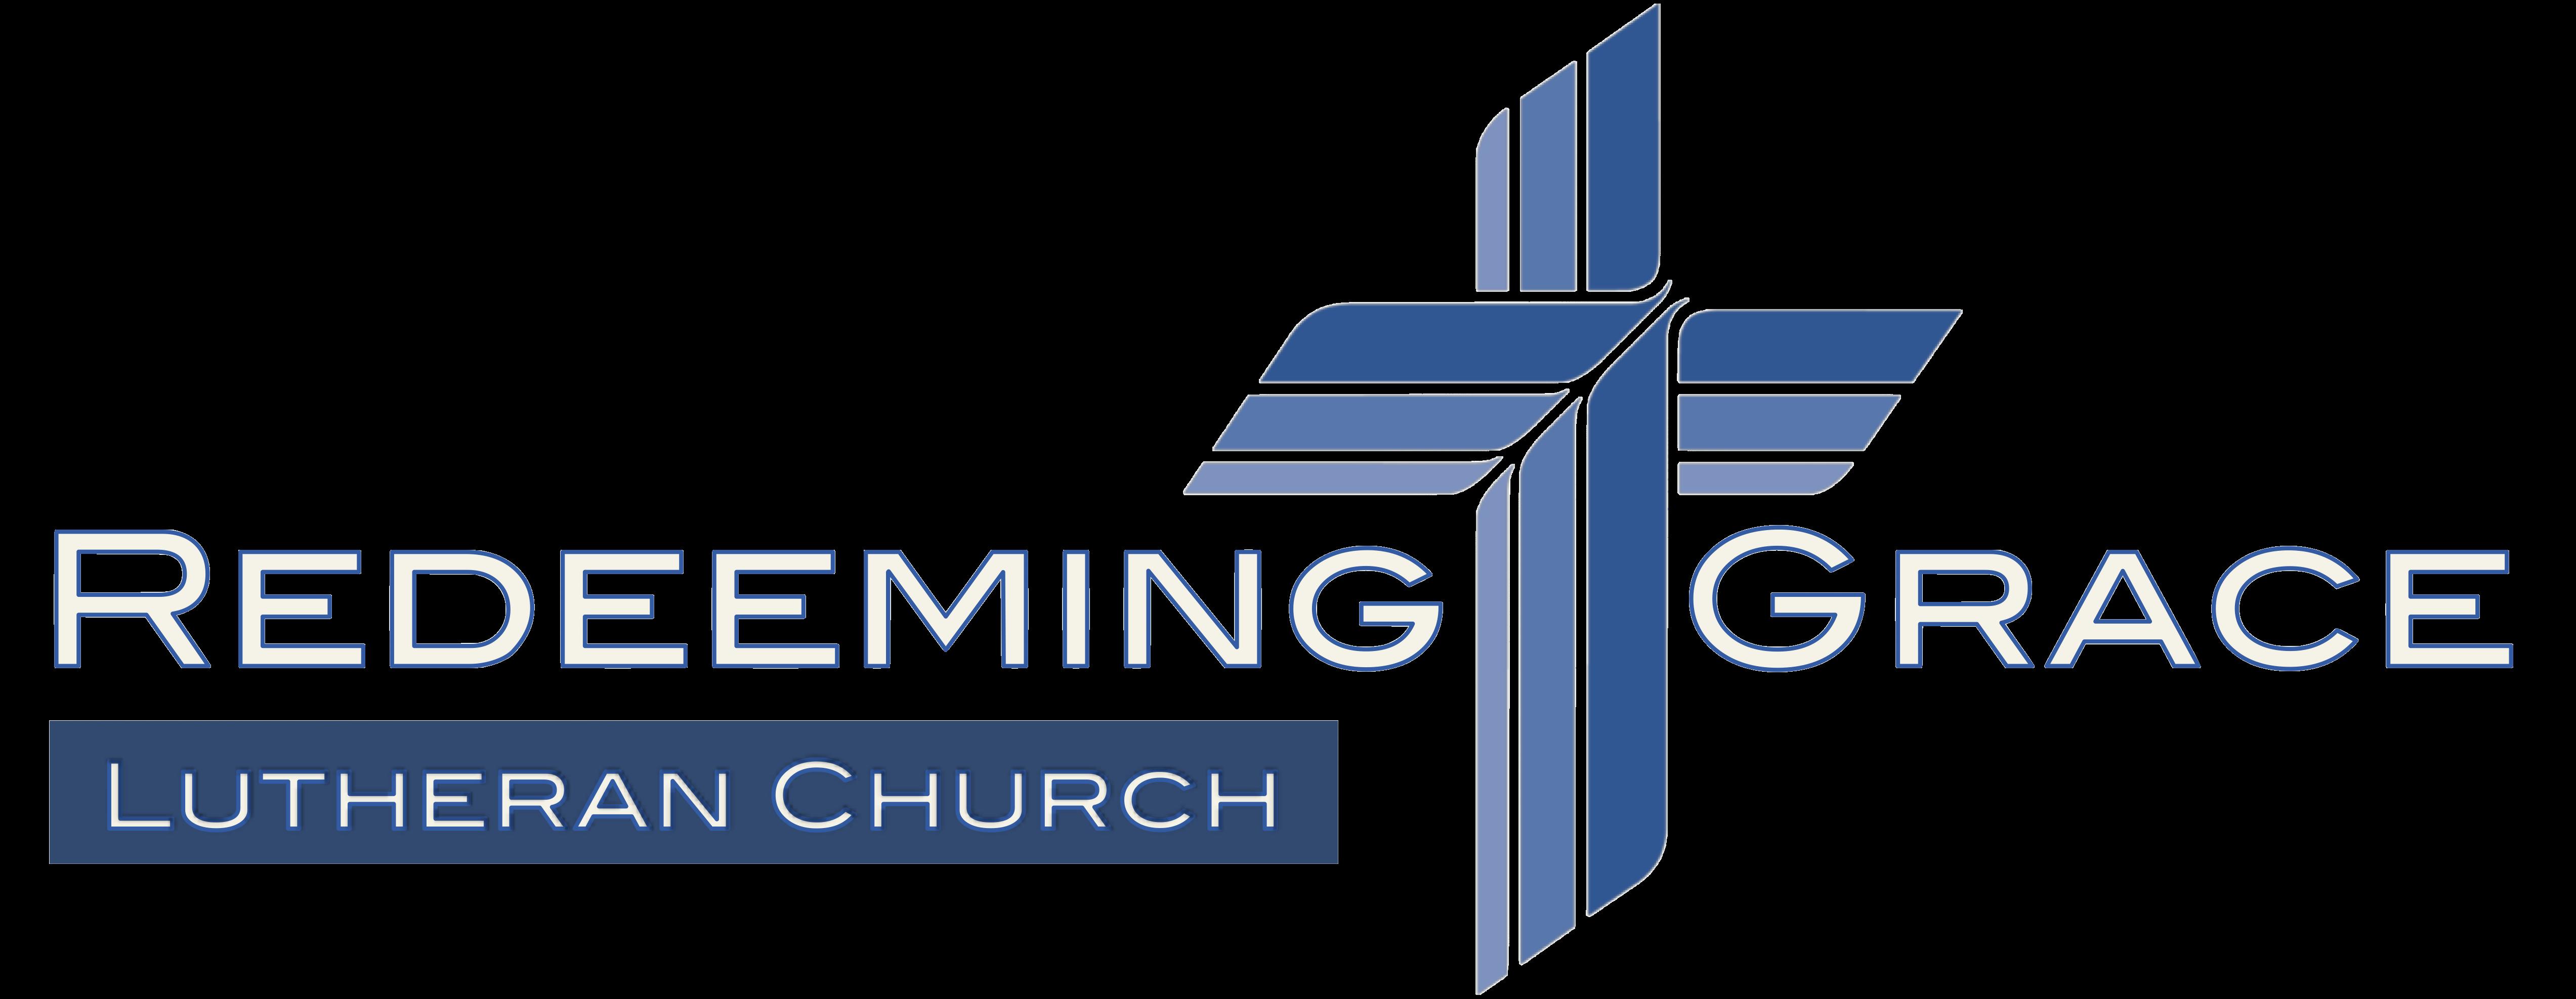 Redeeming Grace Lutheran Church